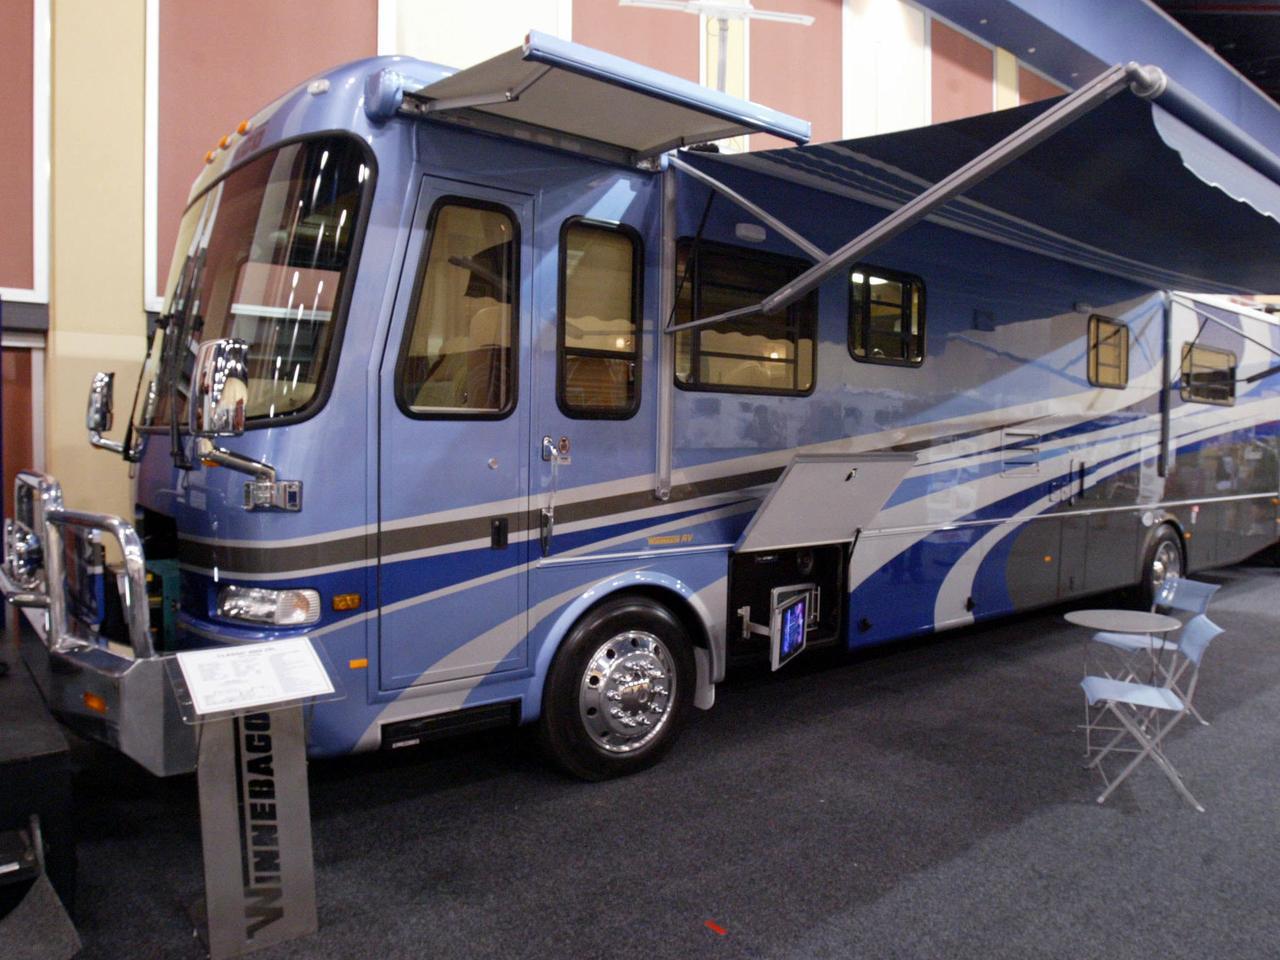 Winnebago luxury motorhome worth $590,000 at Caravan and Camping Show at Wayville Showgrounds 22 Feb 2006. motor home